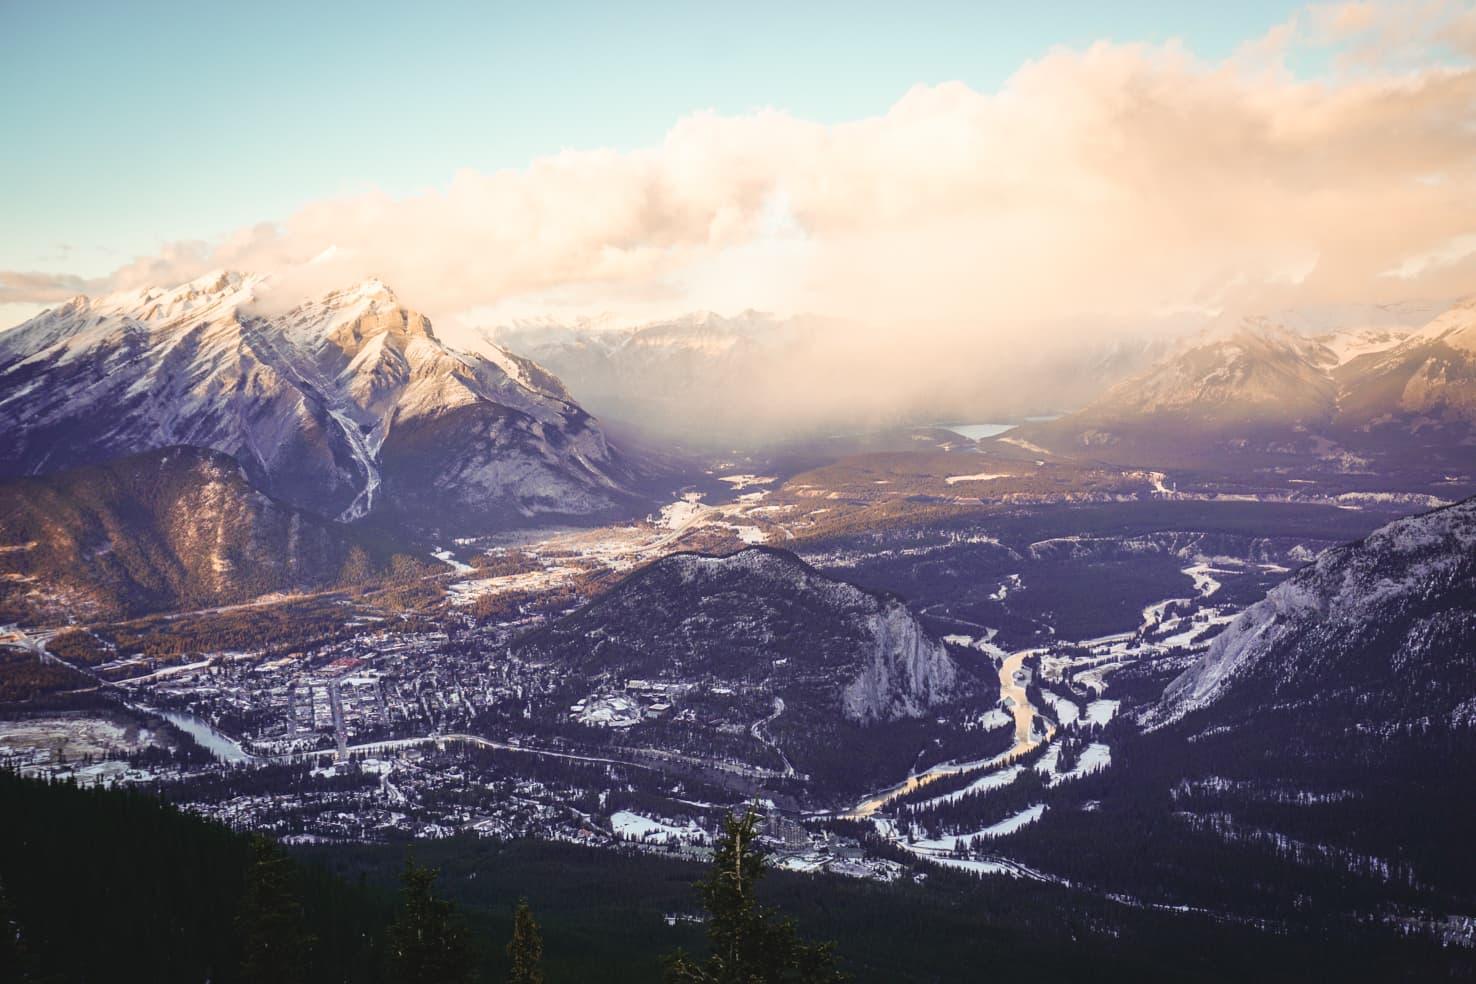 Banff Packing List - Banff in winter from Sulphur Mountain